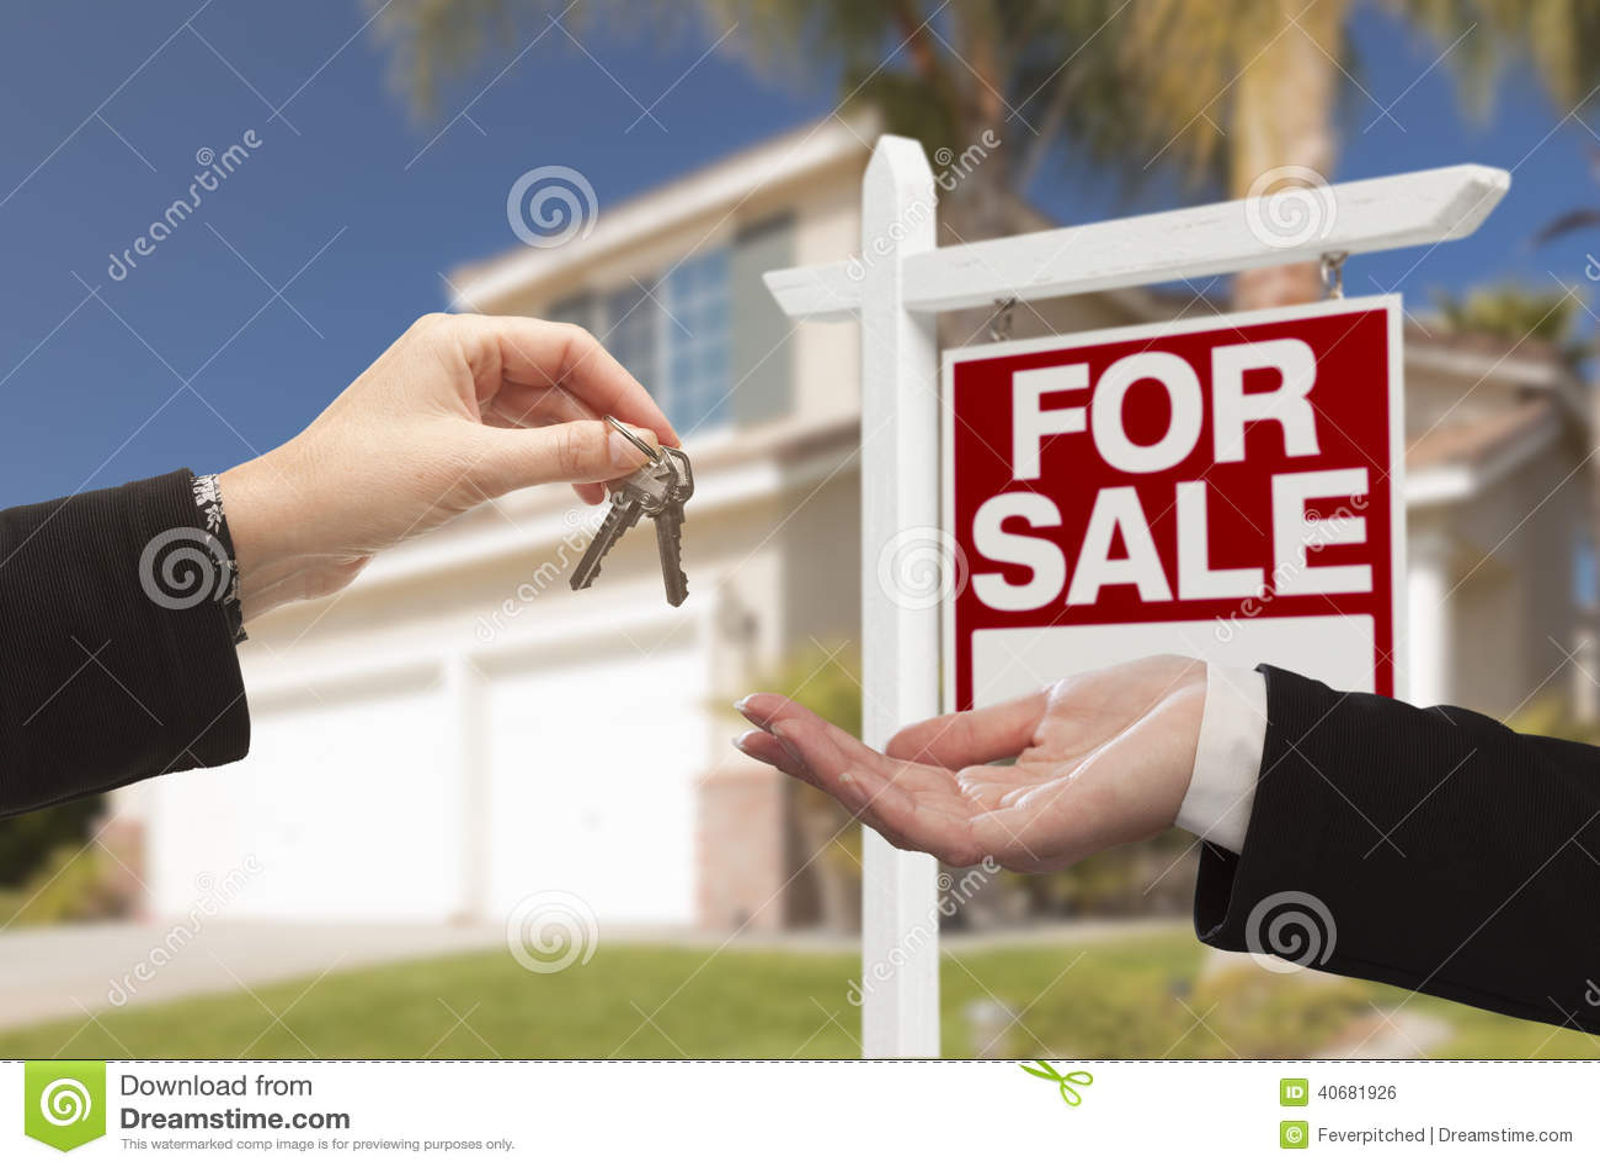 how to start real estate agency in australia